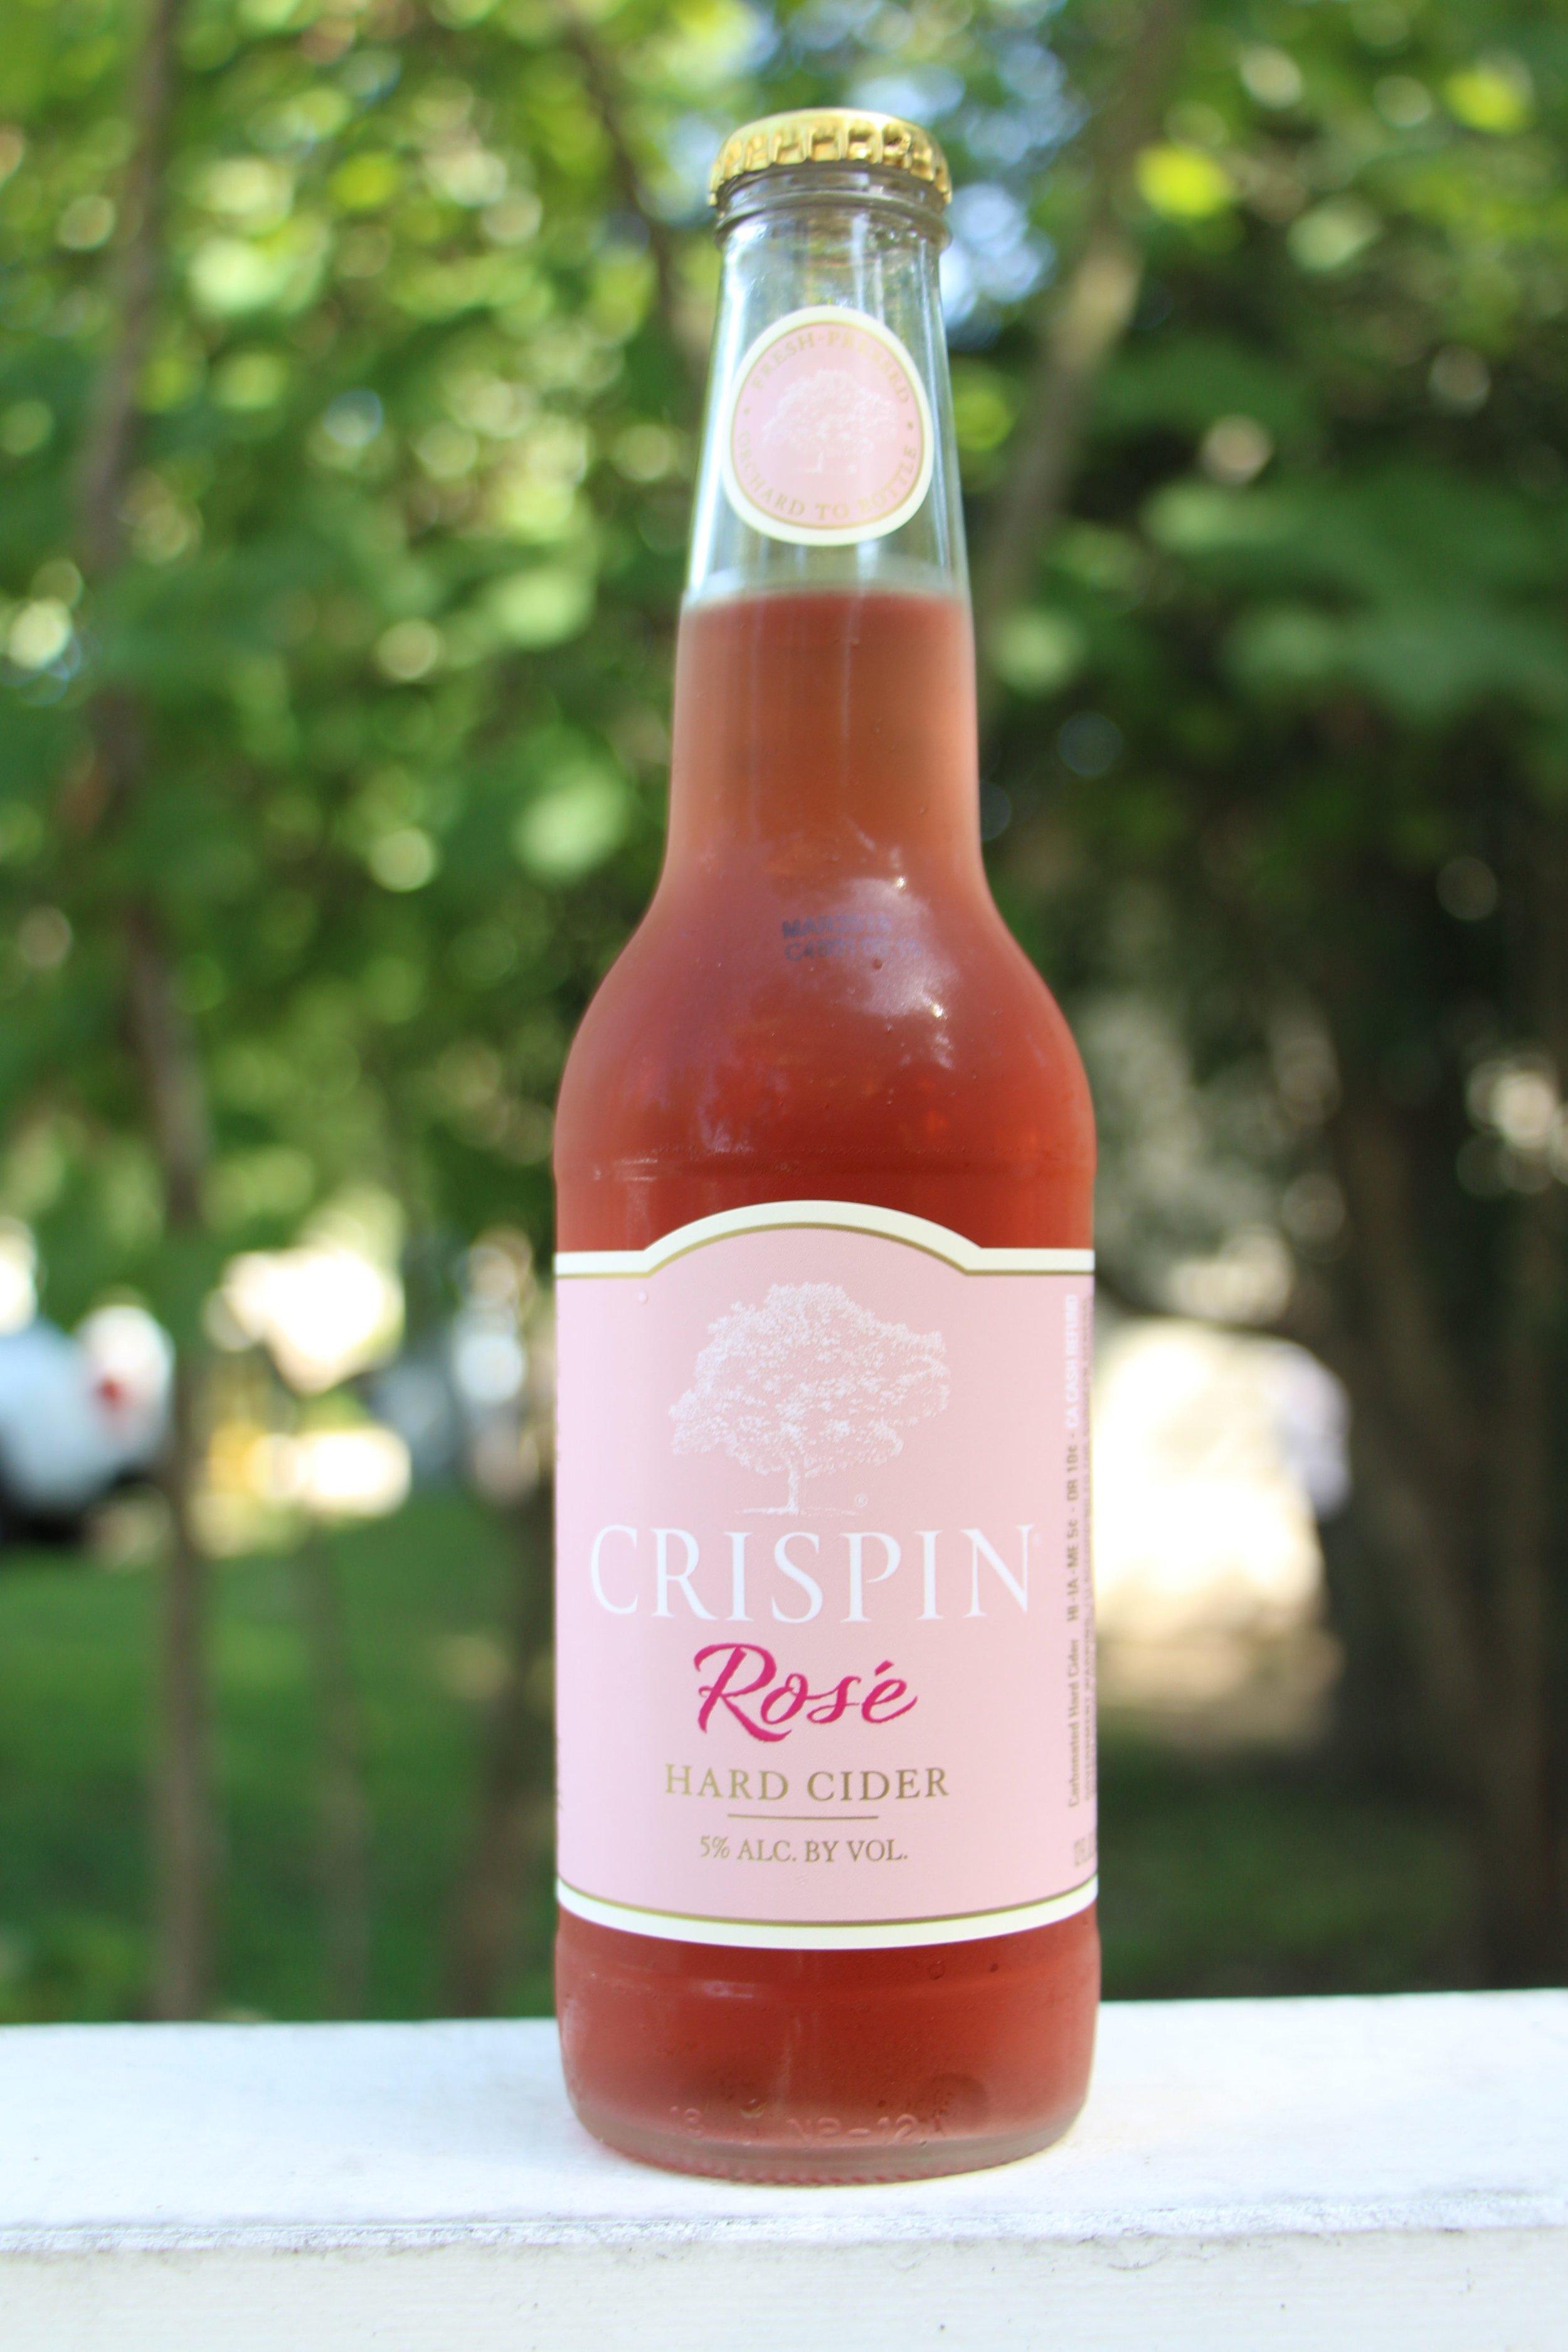 Crispin Rose